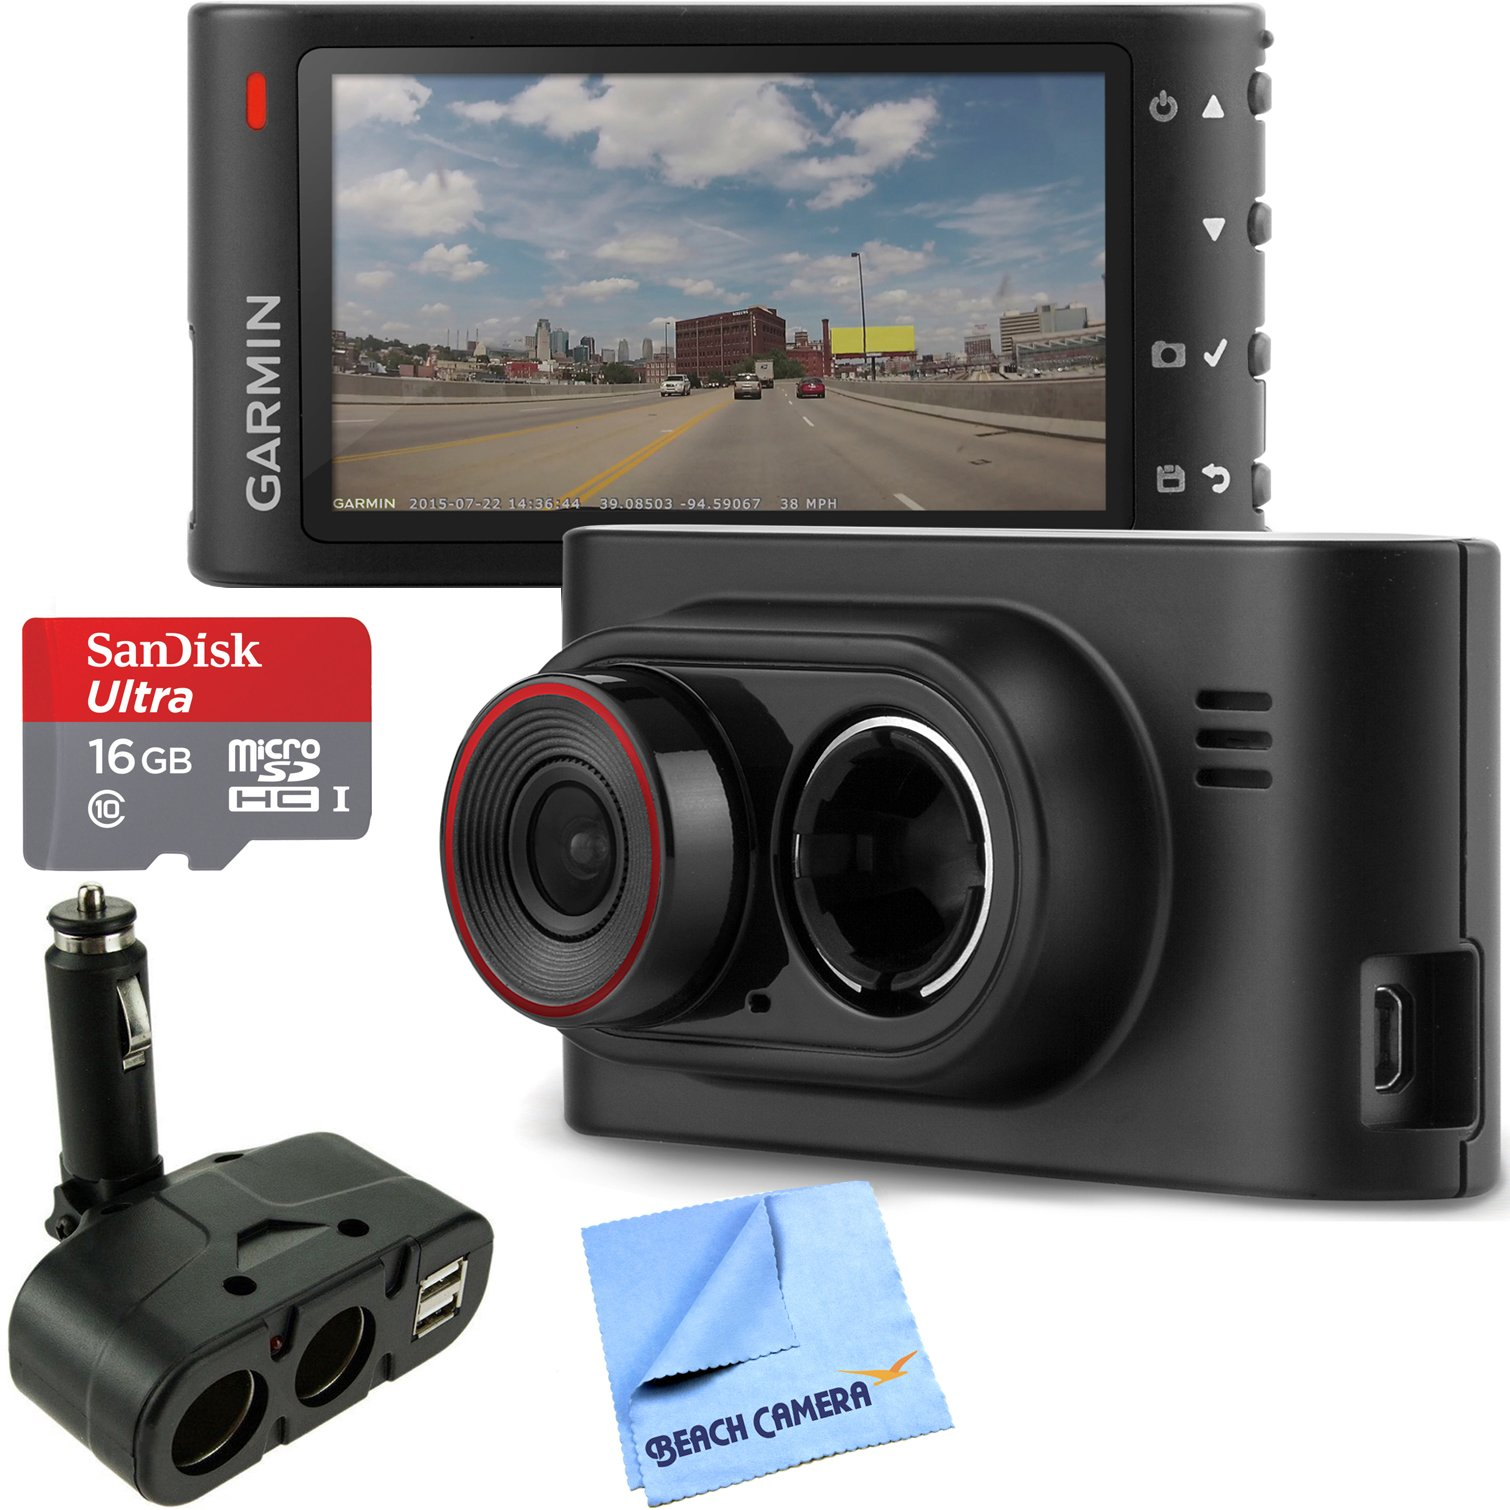 Garmin Dash Cam 35 HD Driving Recorder with GPS + SanDisk microSDHC Ultra 16GB Memory Card with Universal DC 12V/24V Dual USB 4 Port Car Charger and Beach Camera Microfiber Cloth